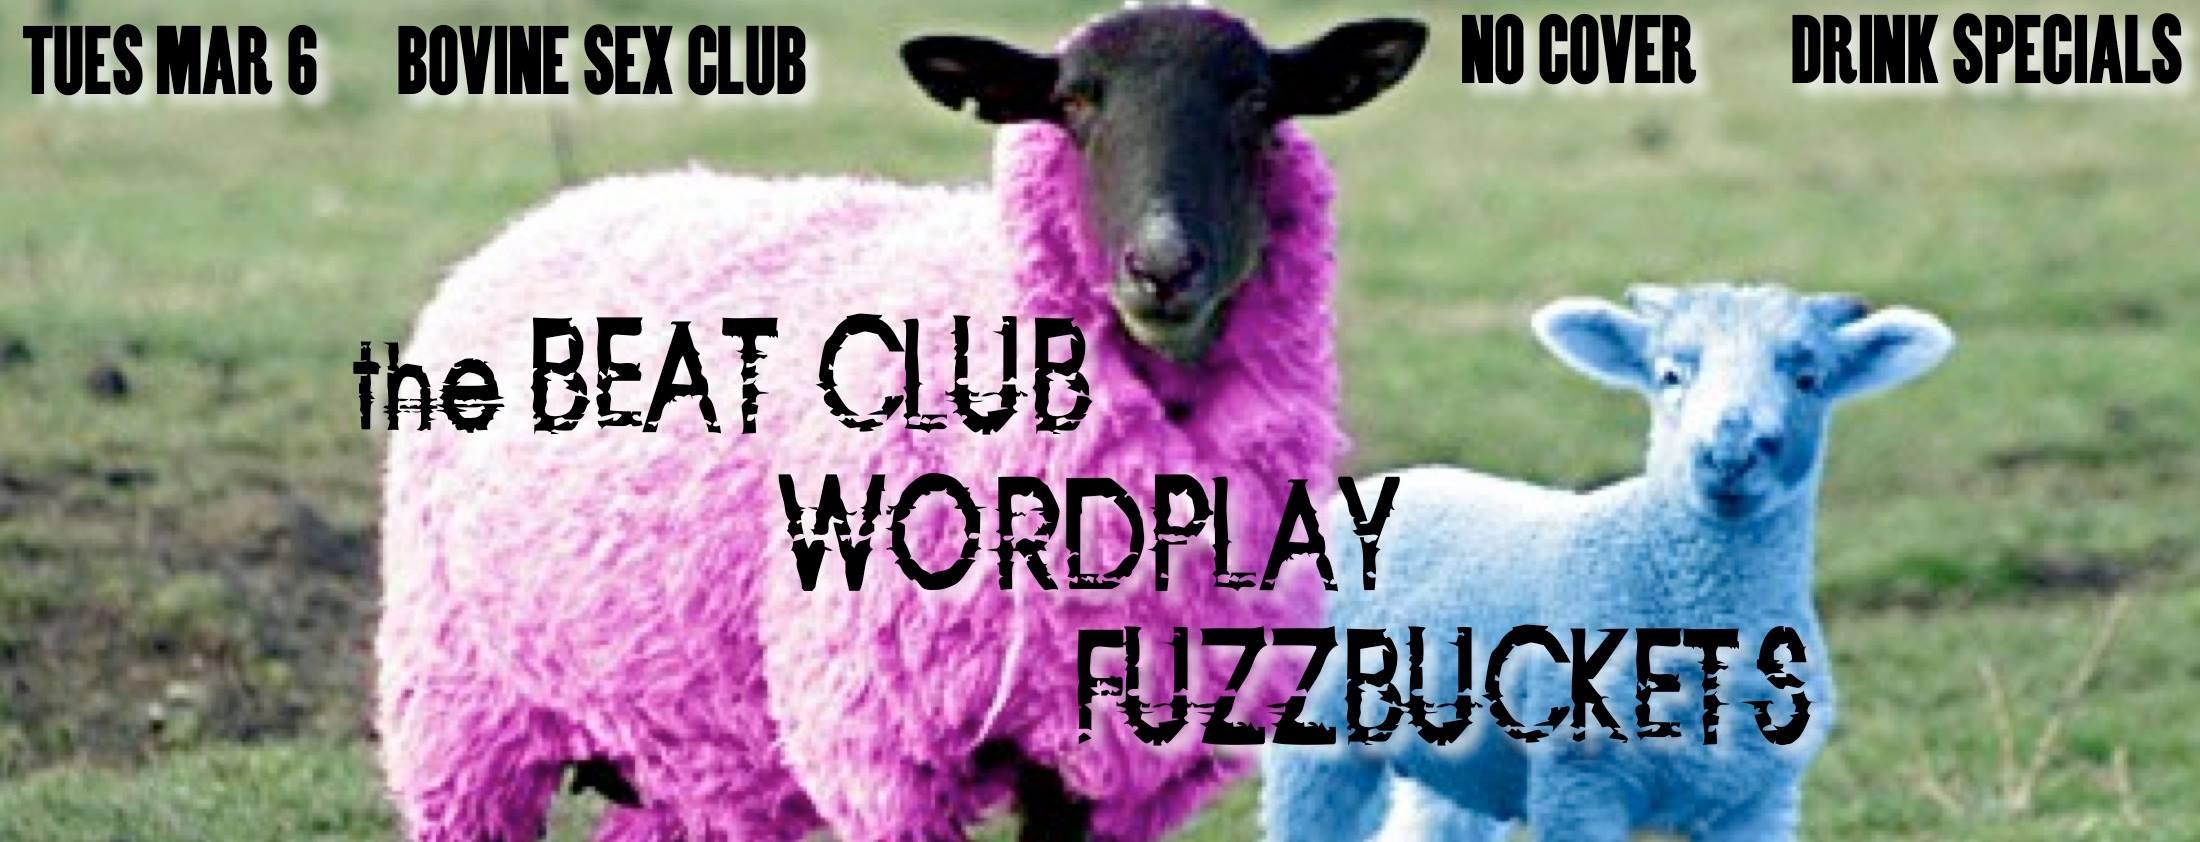 the BEAT CLUB, WORDPLAY, FUZZBUCKETS